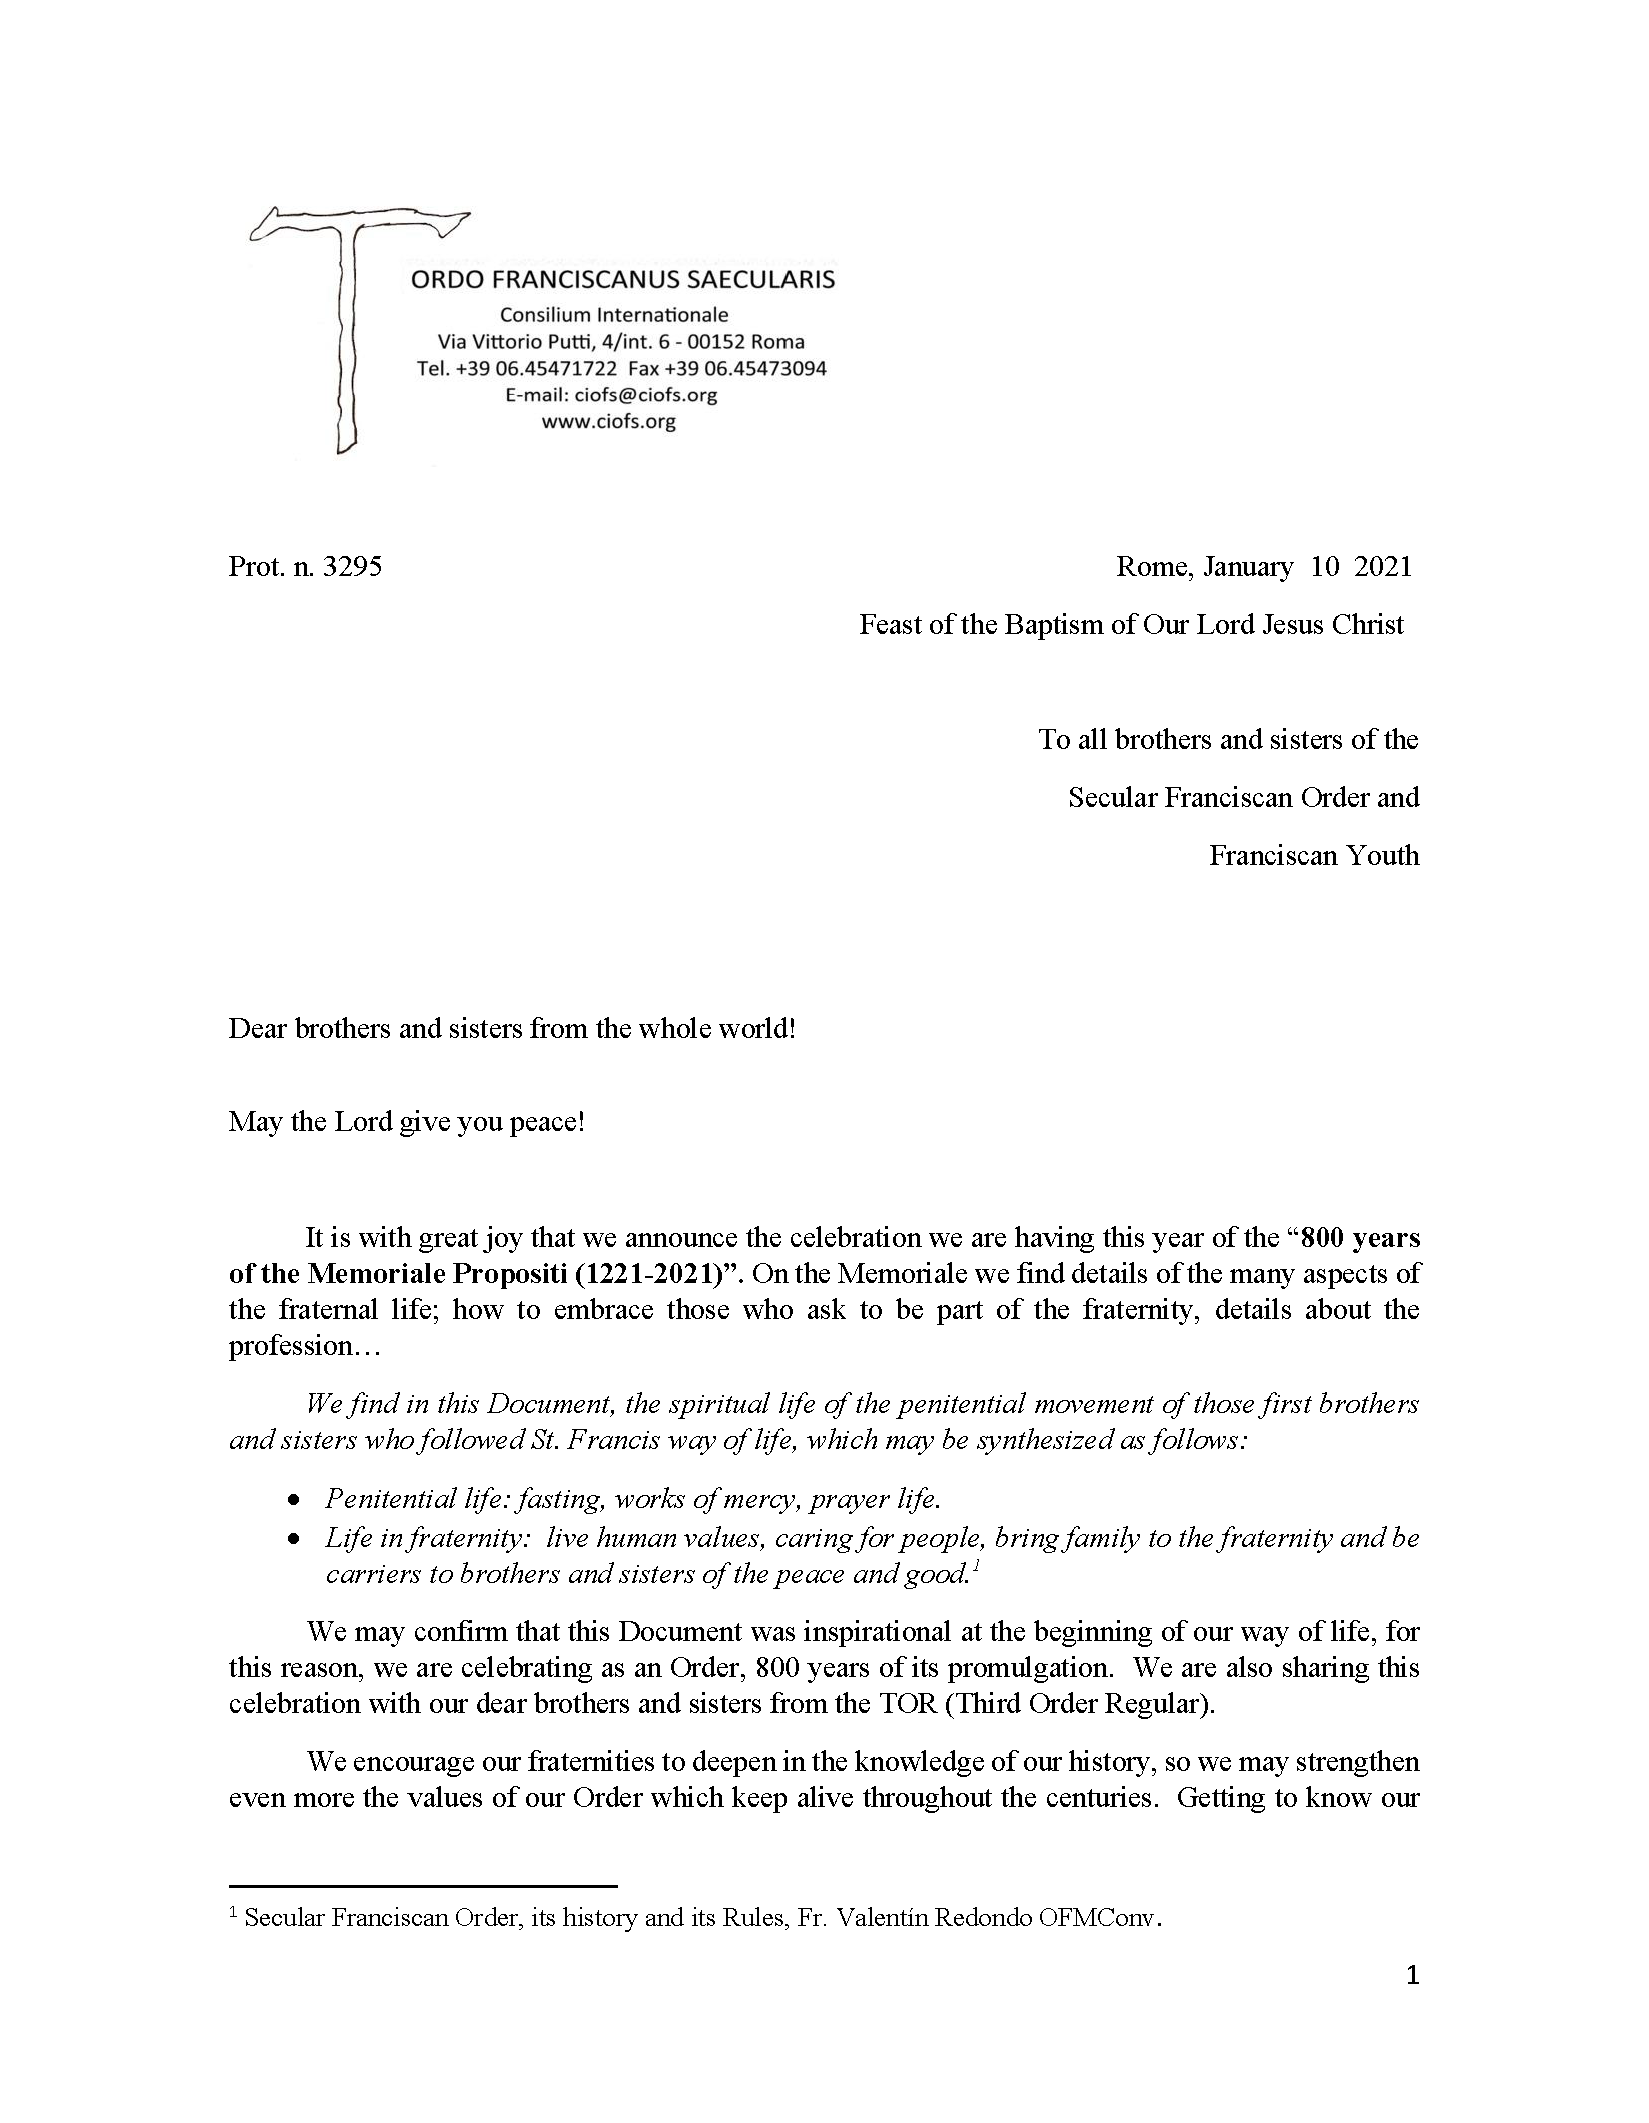 Memoriale Propositi letter